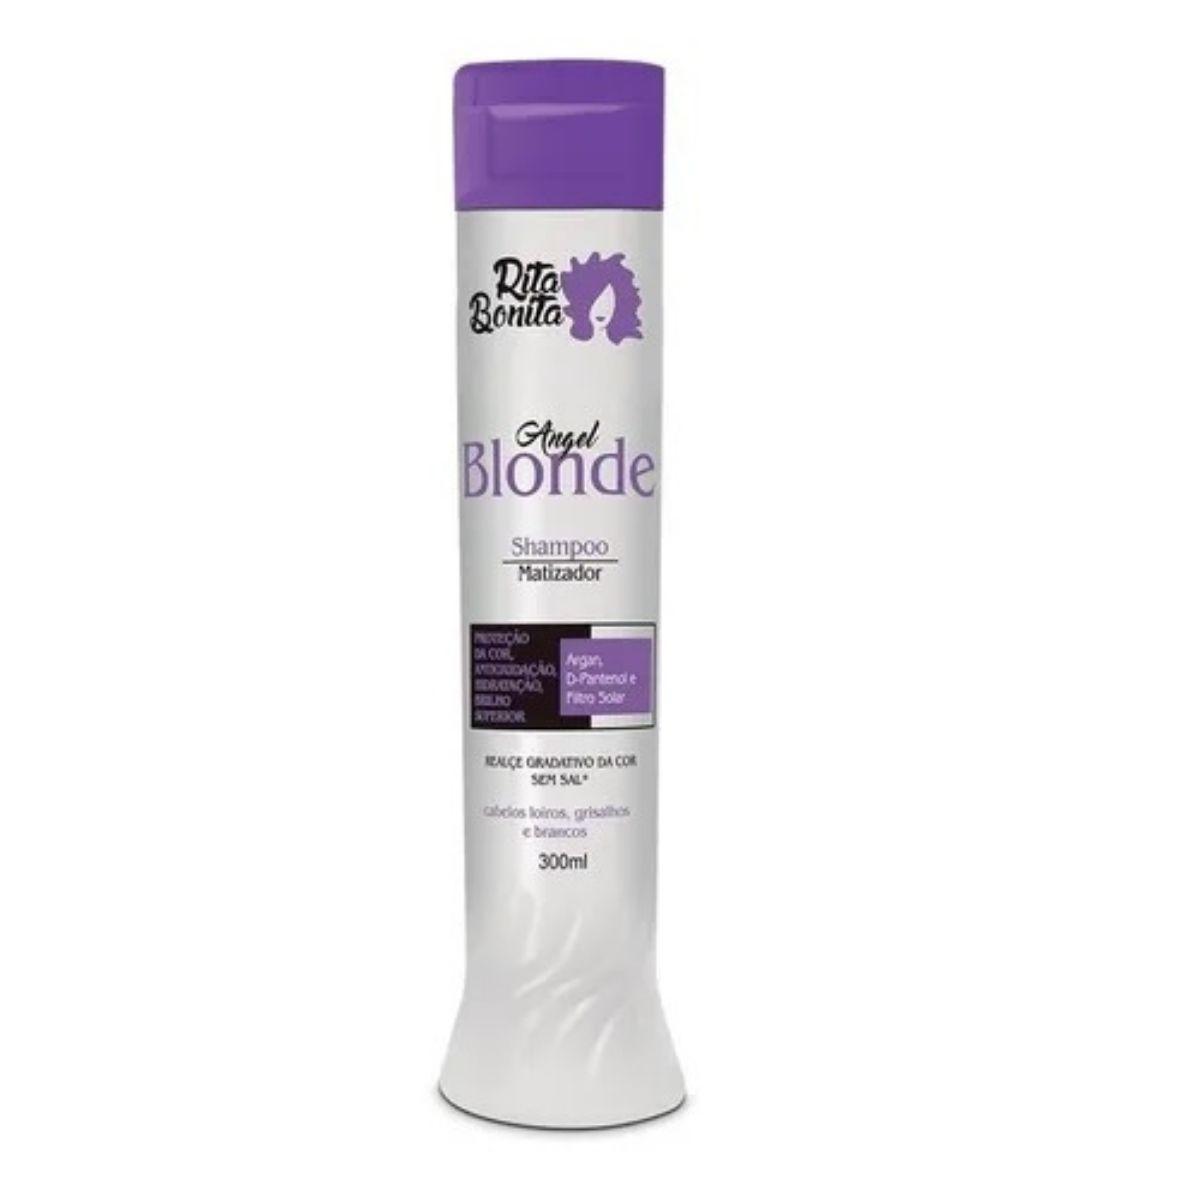 Angel Blonde - Shampoo Rita Bonita 300ml